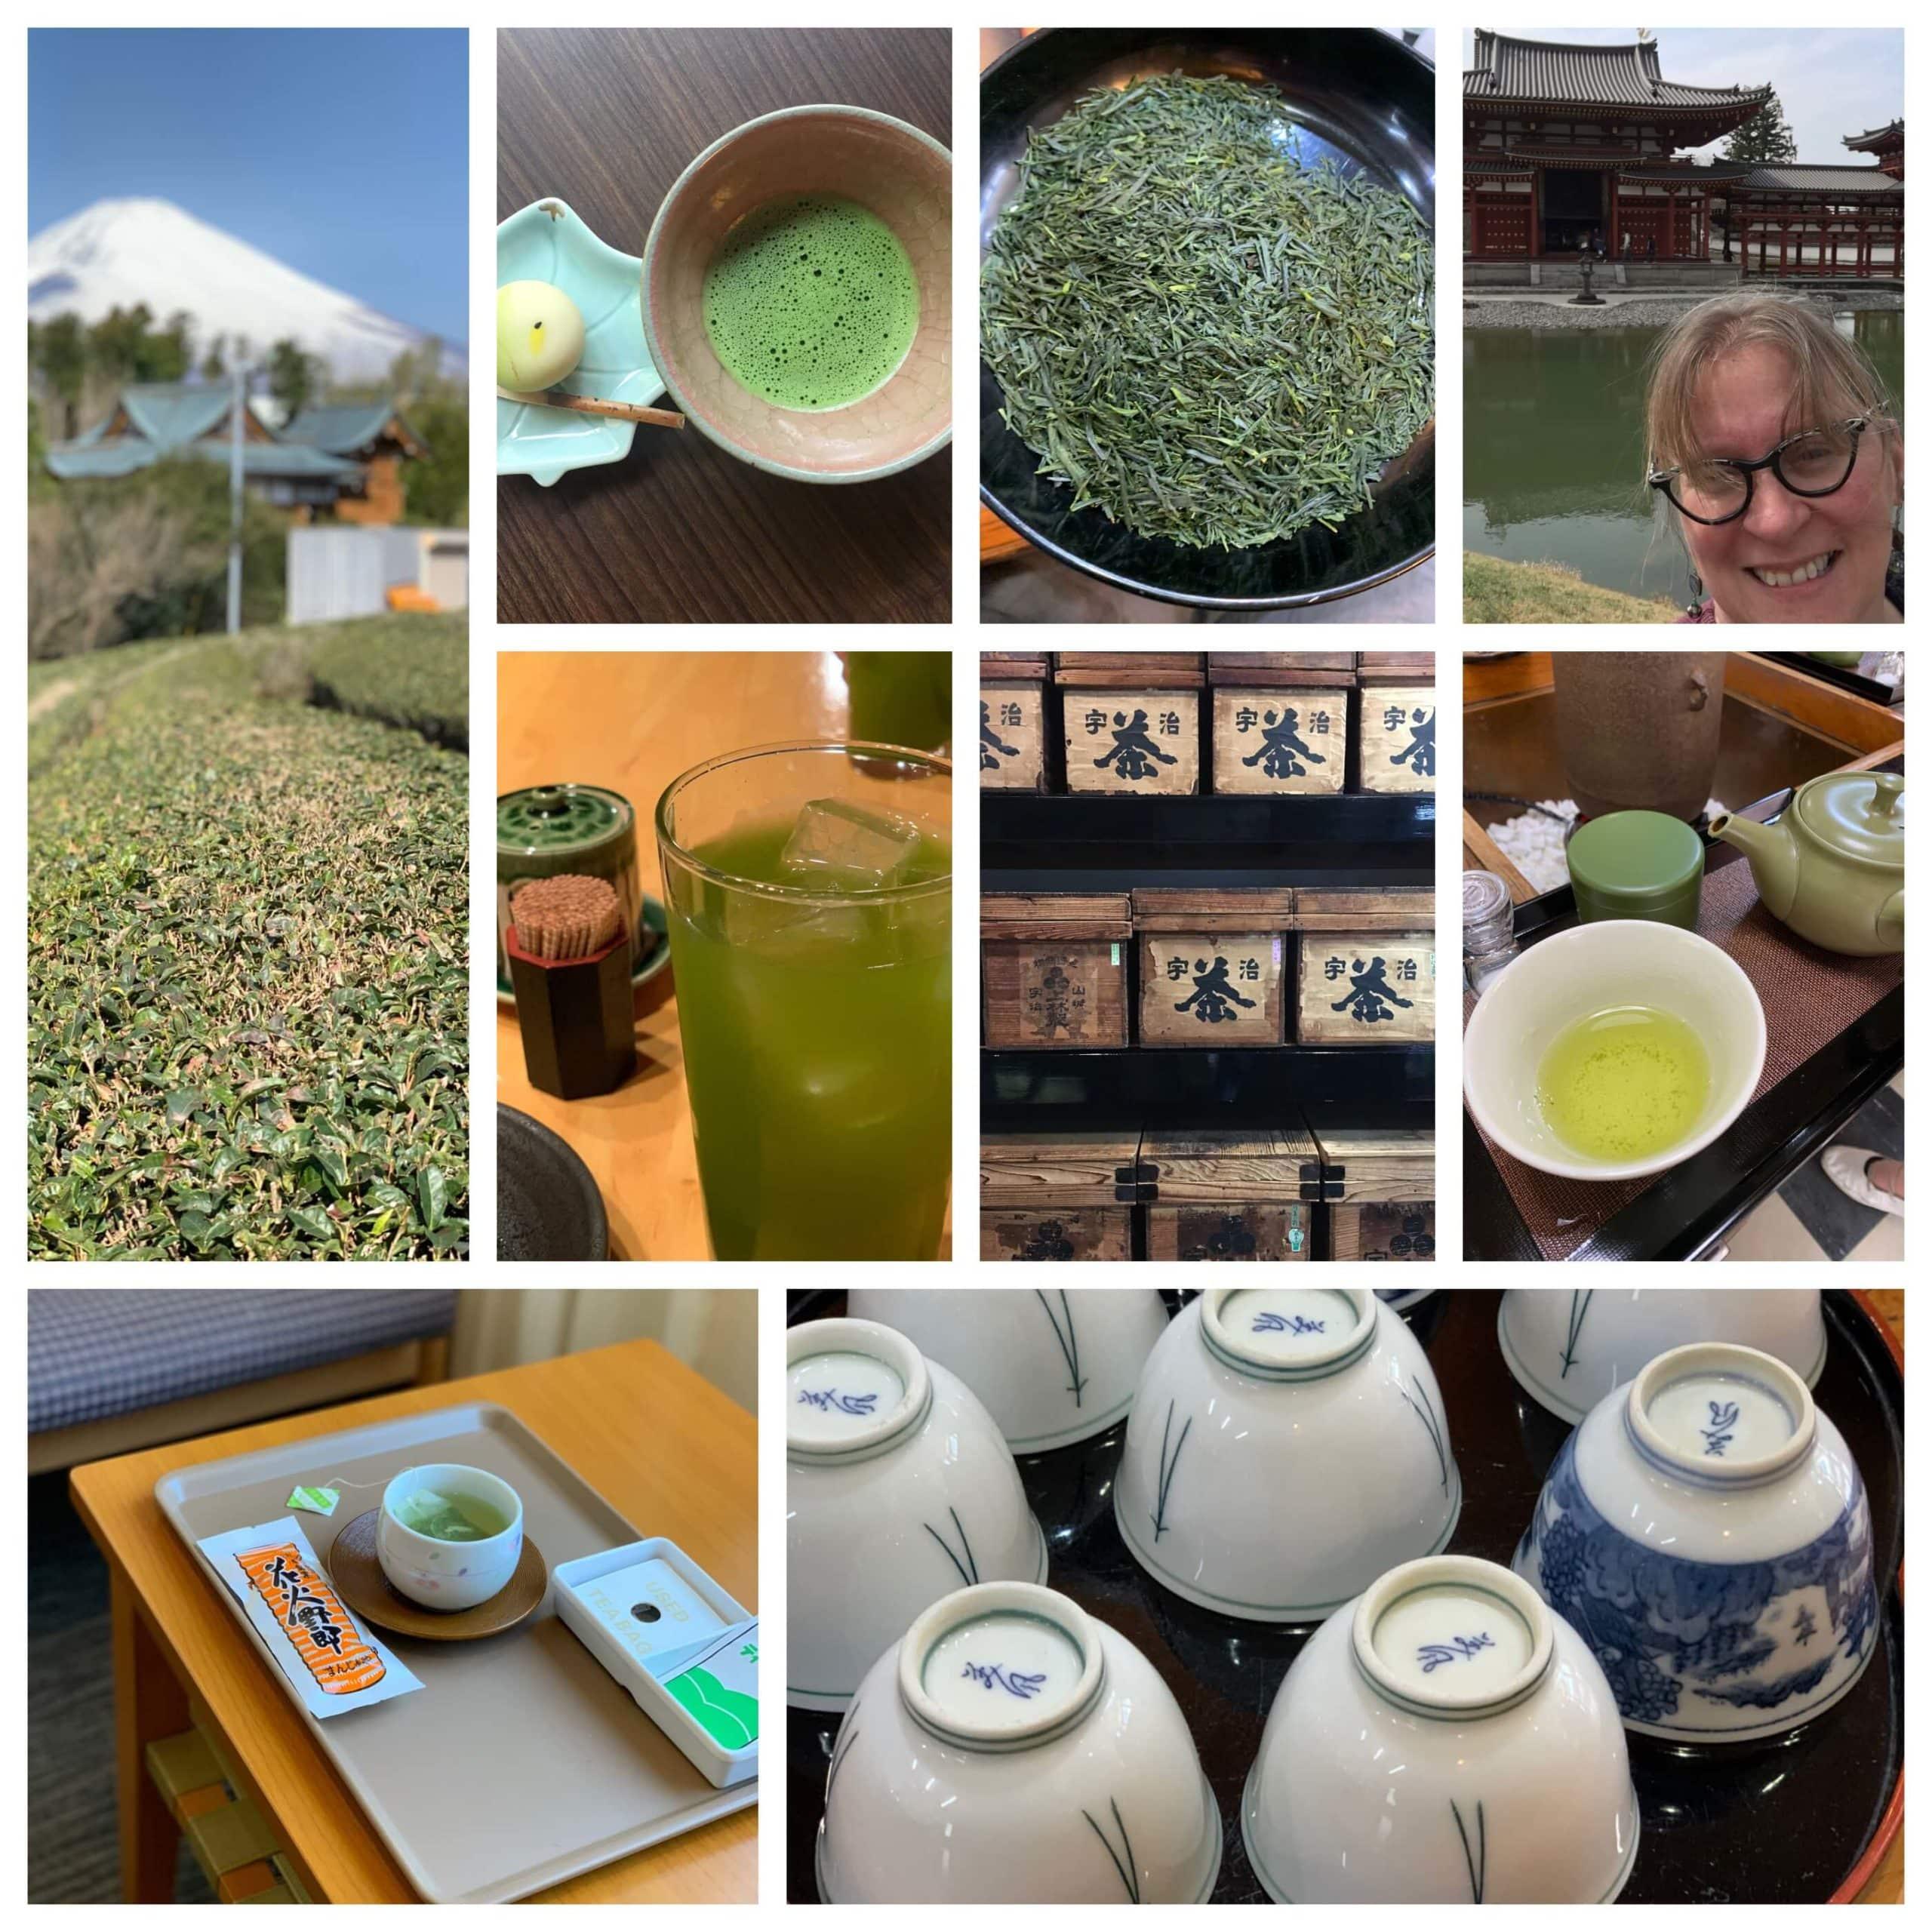 Green Teatime in Shizuoka, Japan!